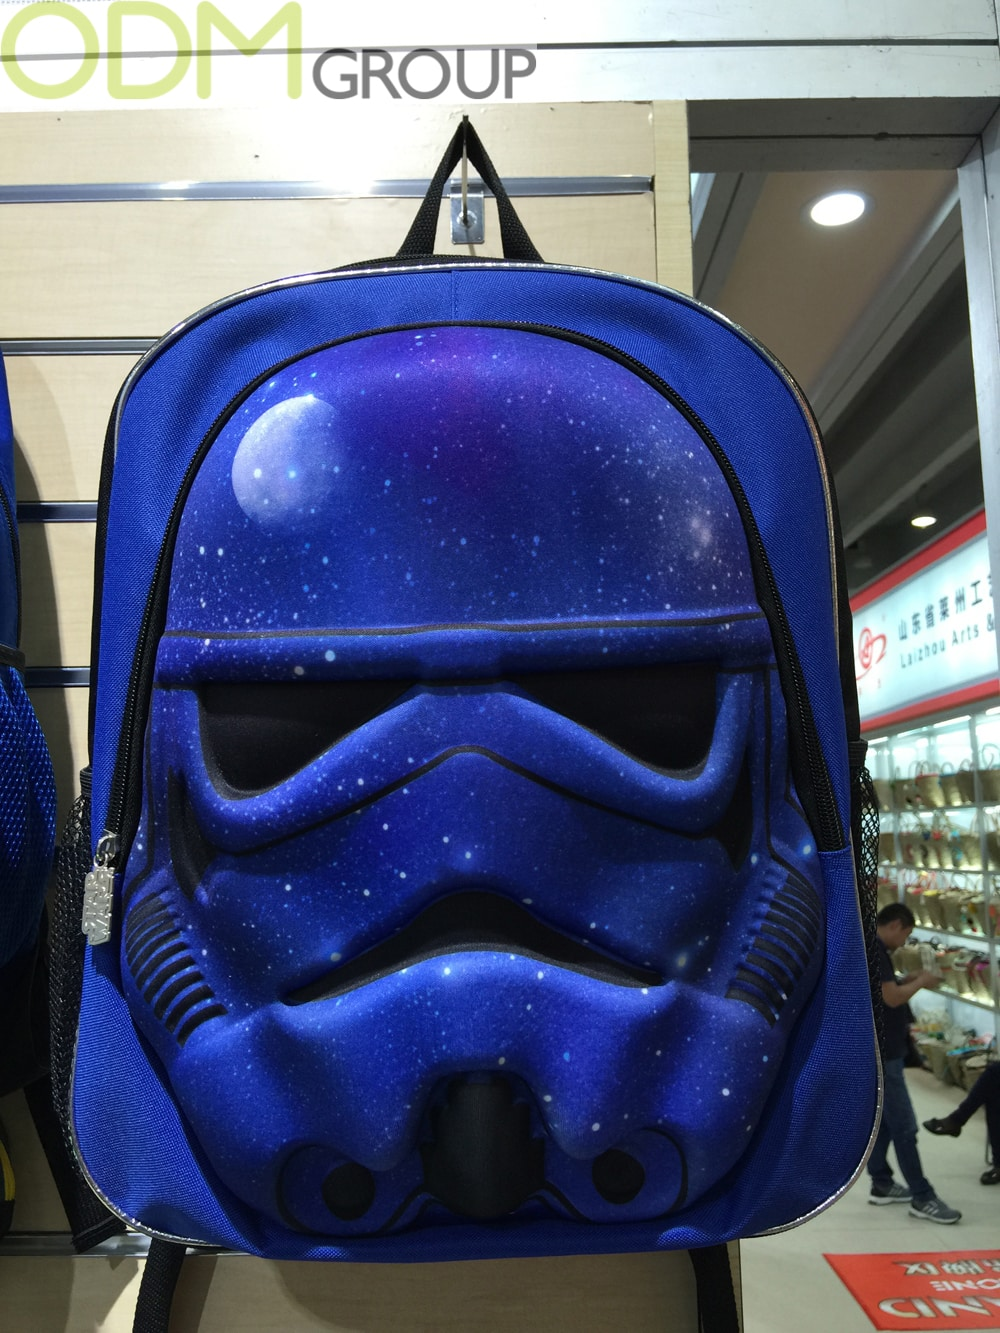 Make Backpacks Fun With an EVA Moulded Custom Bag